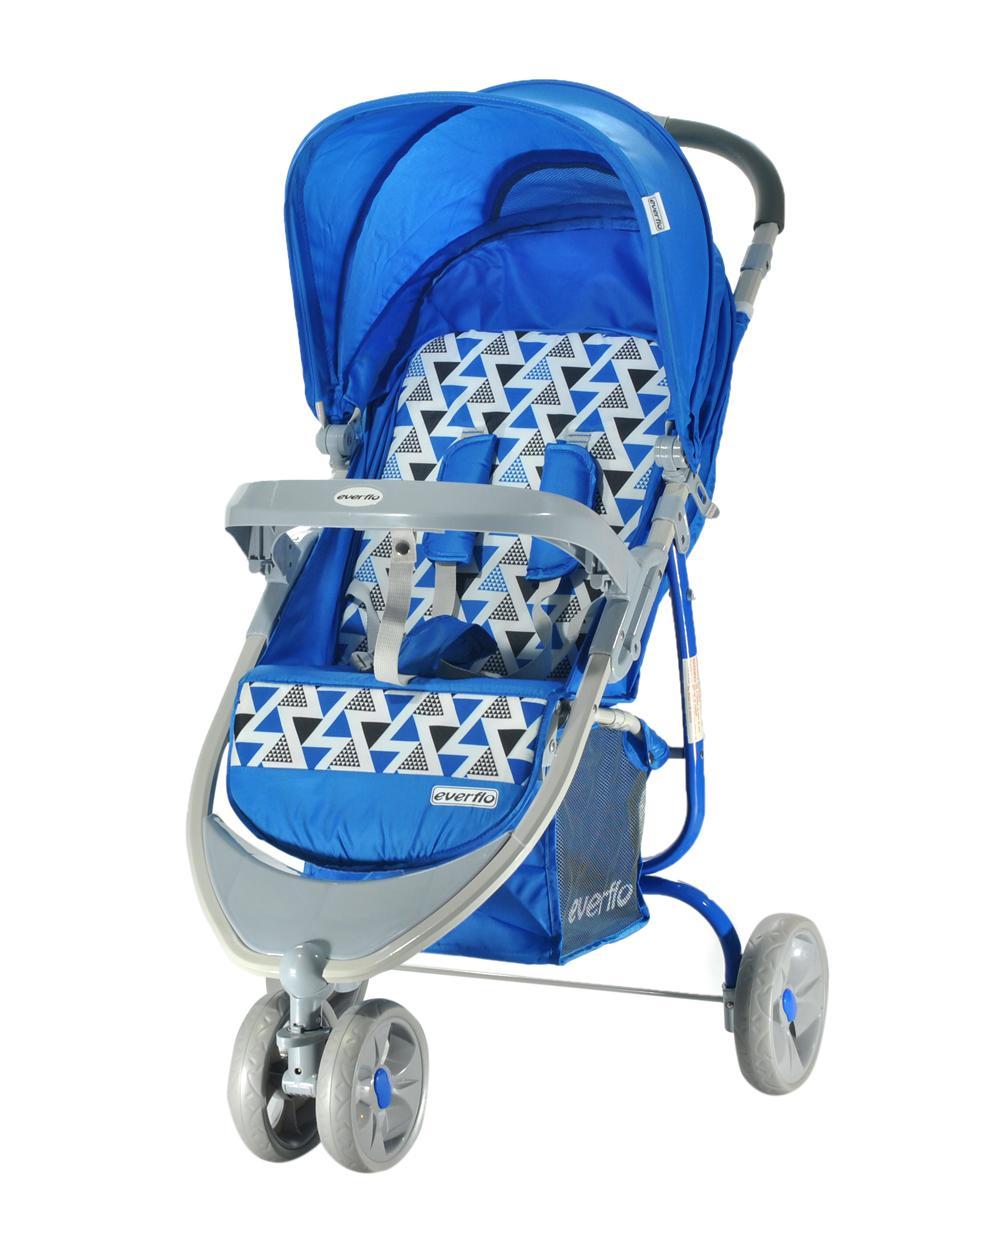 Купить УТ000000297, EVERFLO Коляска прогулочная Country E-940 Blue [E-940 Country], Детские коляски